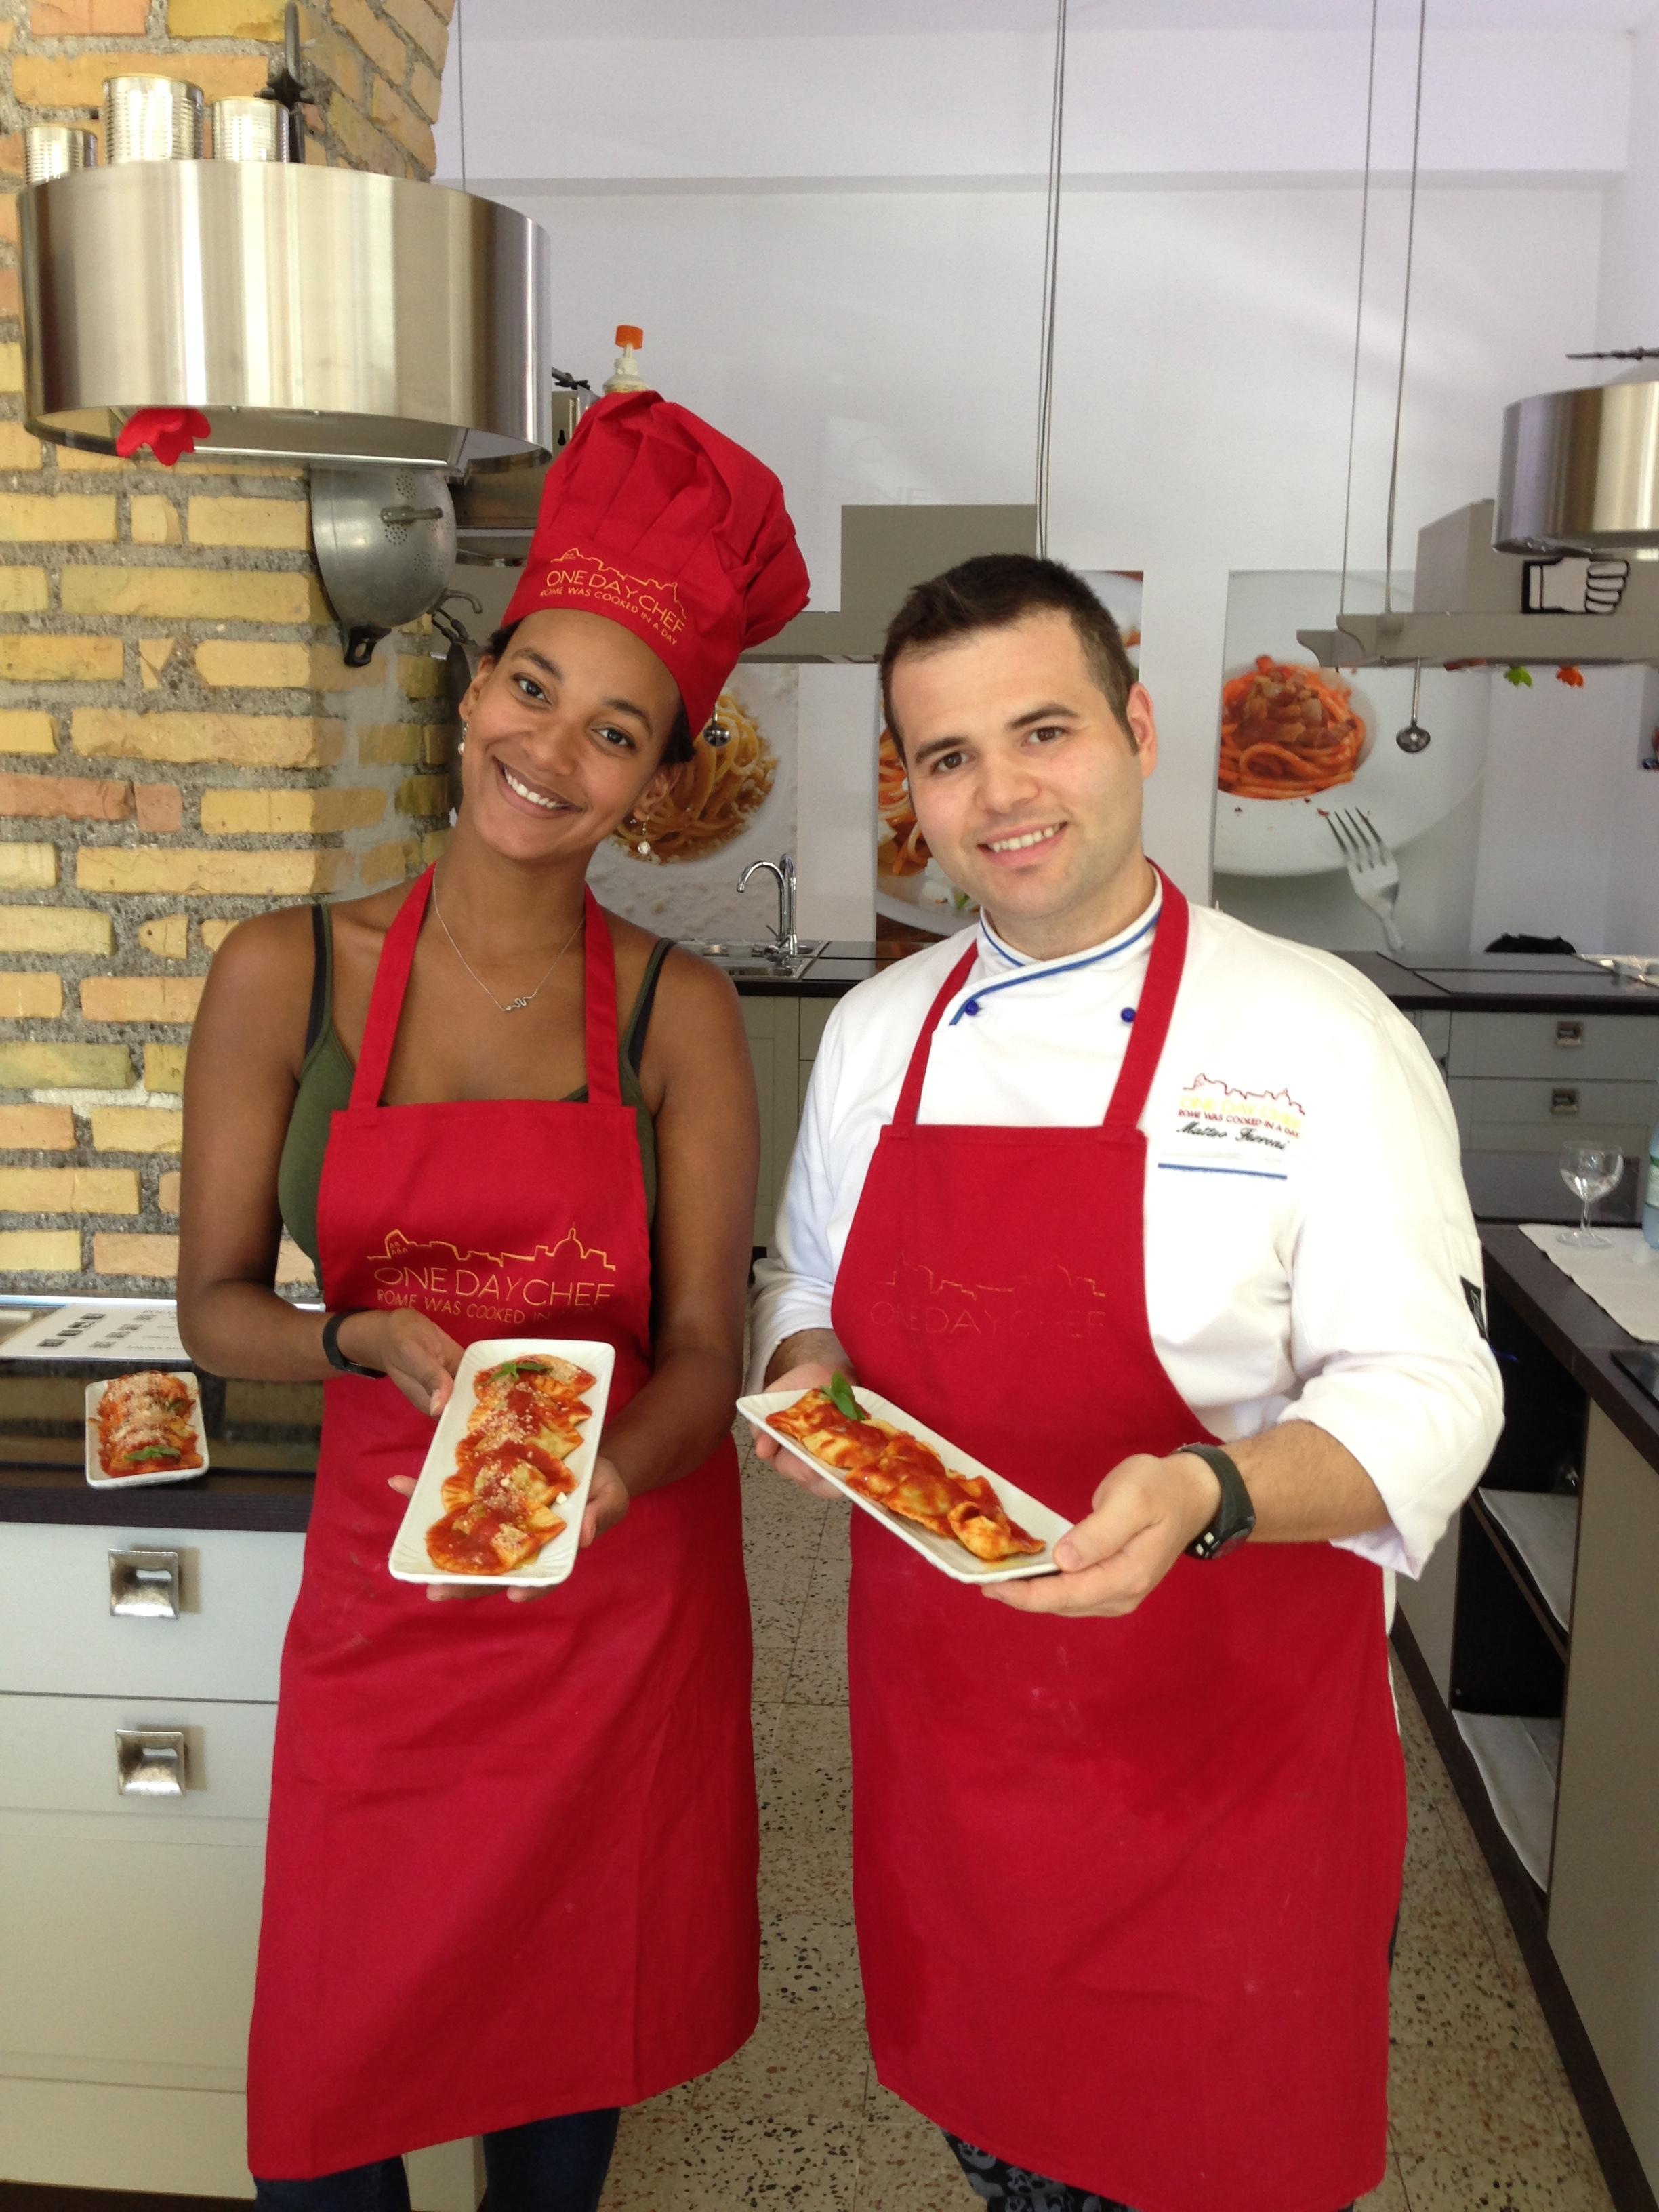 ochristine-olivia-christine-one-day-chef